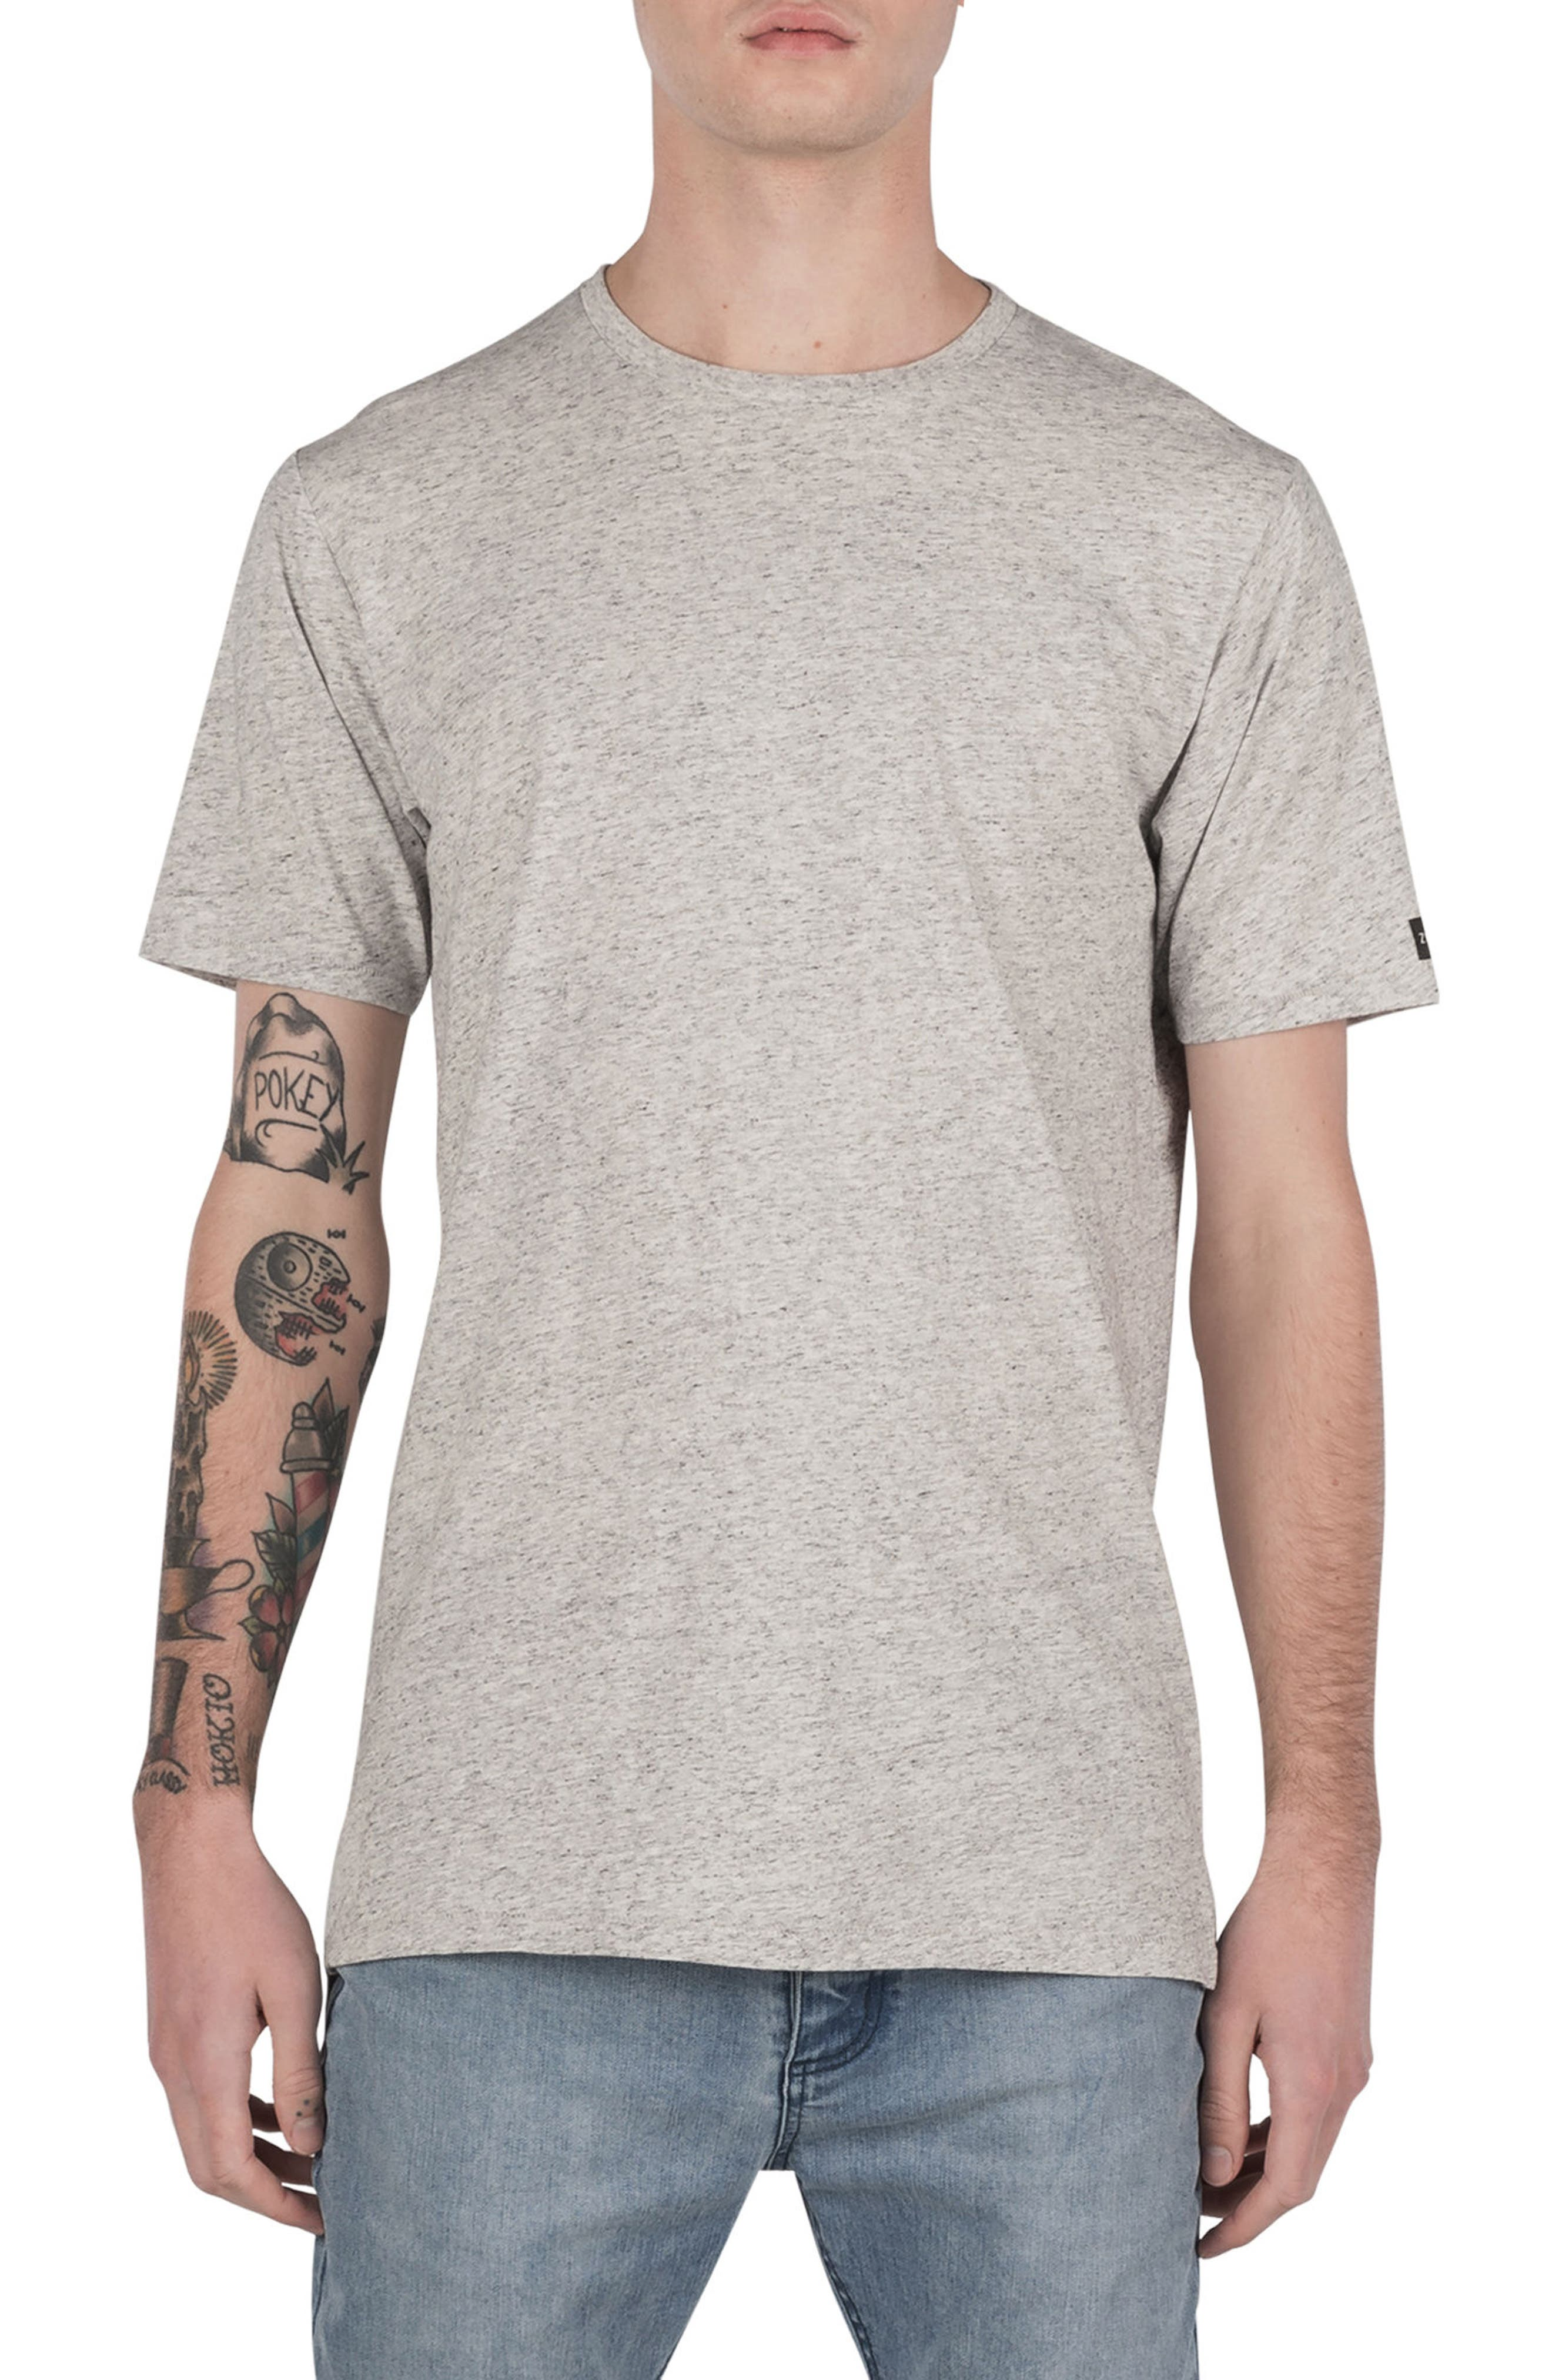 Flintlock T-Shirt,                             Main thumbnail 1, color,                             Storm Marl